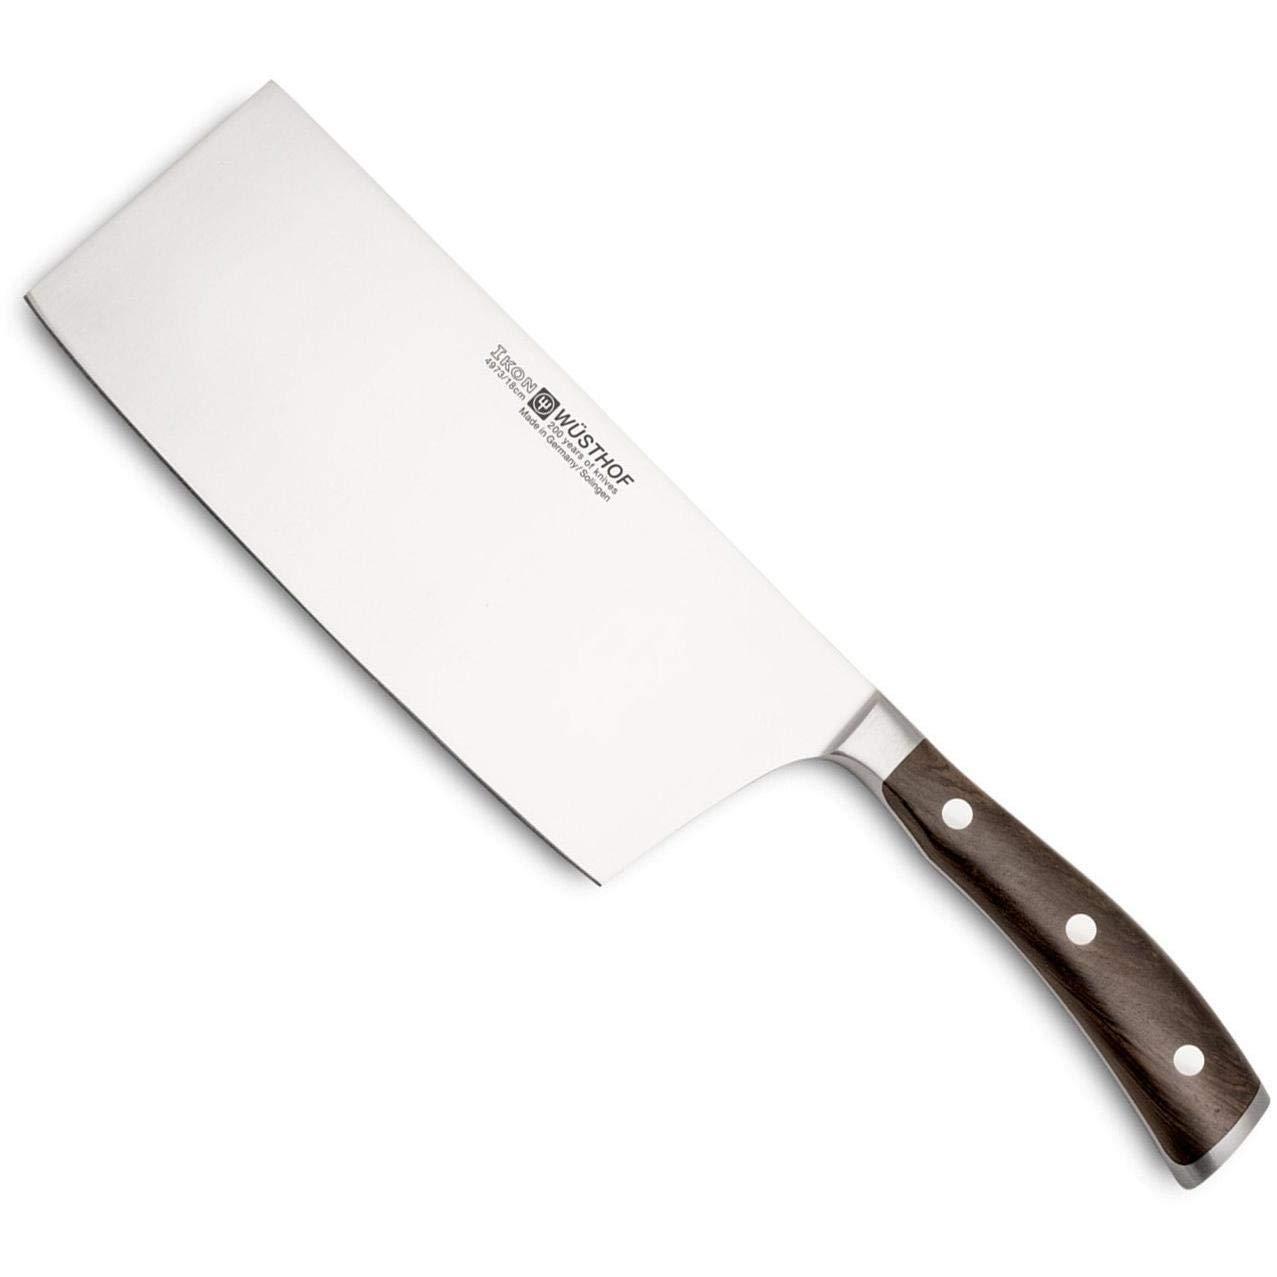 Wüsthof Ikon Chinese Chef's Knife 7'' African Blackwood